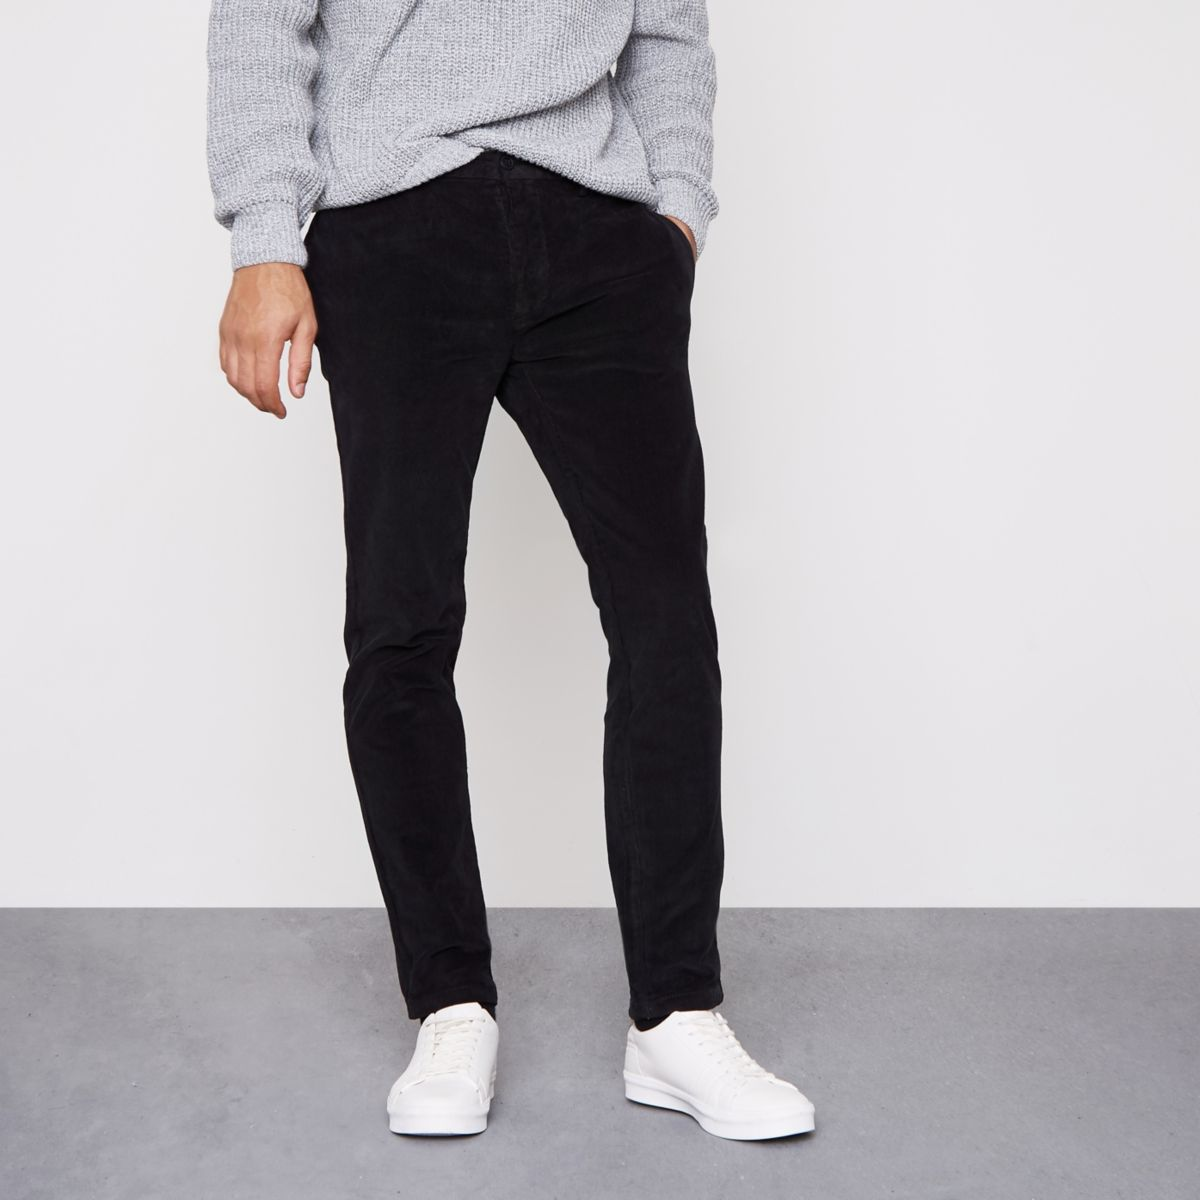 Pantalon skinny habillé en velours côtelé noir